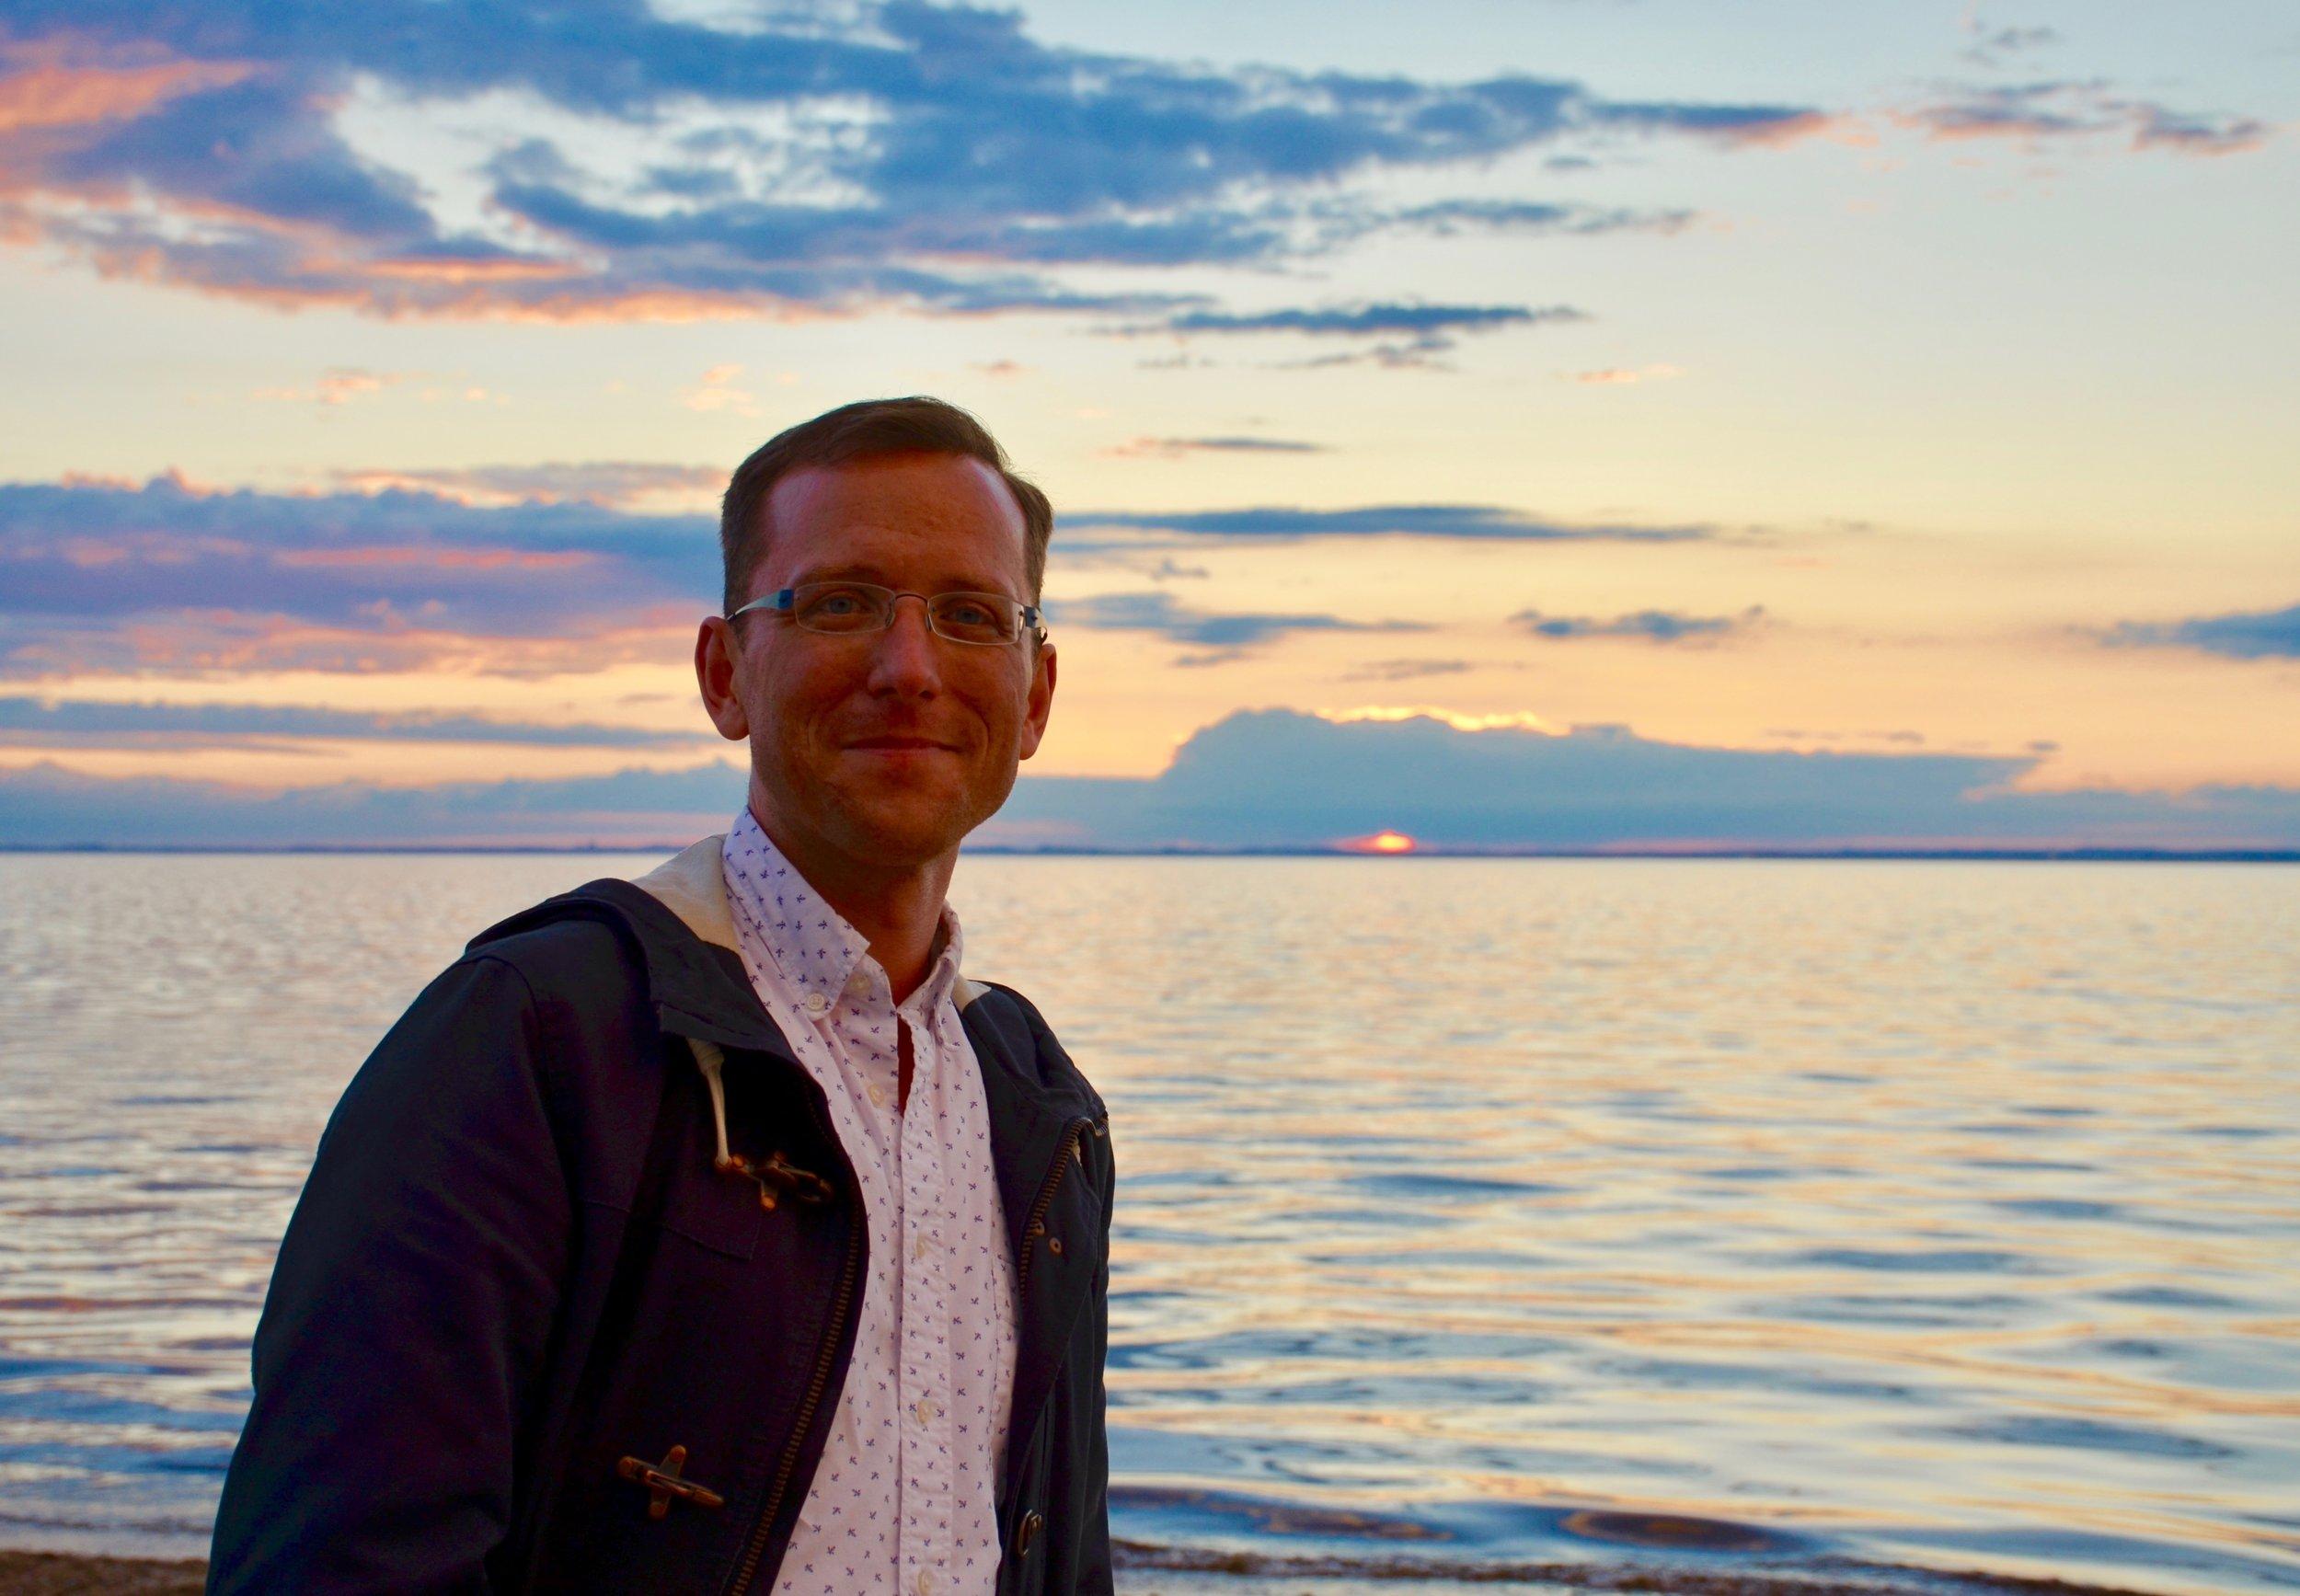 Christian Lane enjoys an evening along the Baltic Sea.